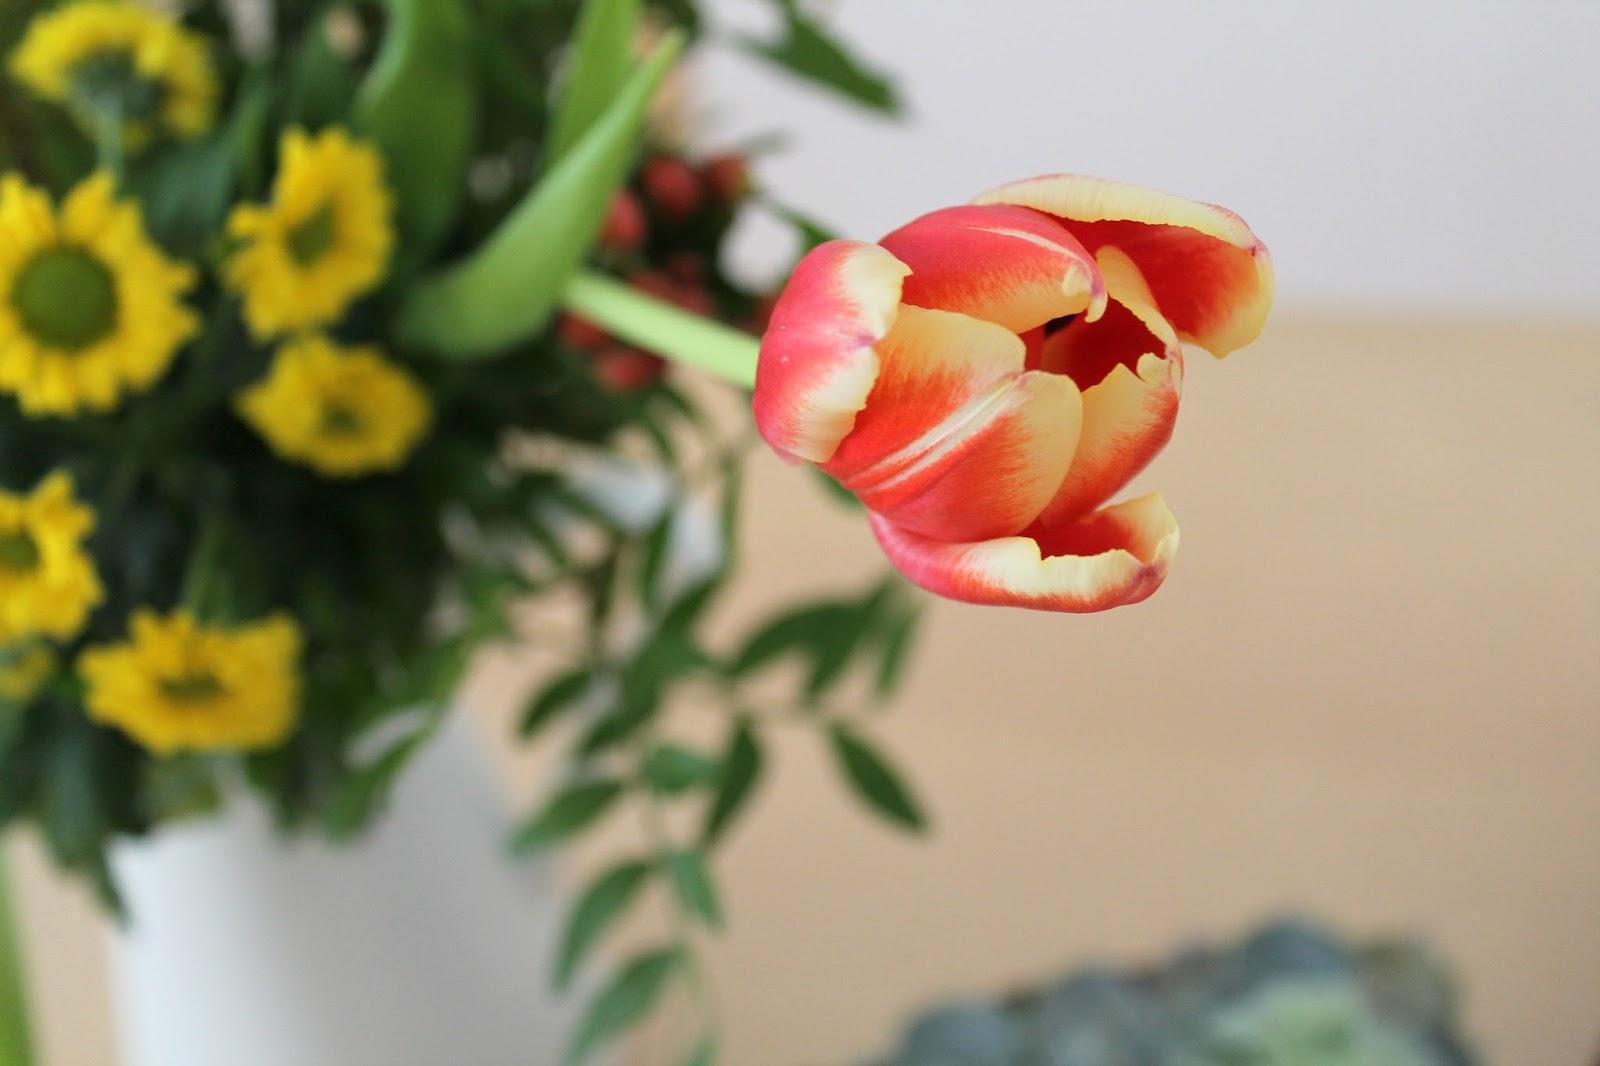 tulips halfopen spring